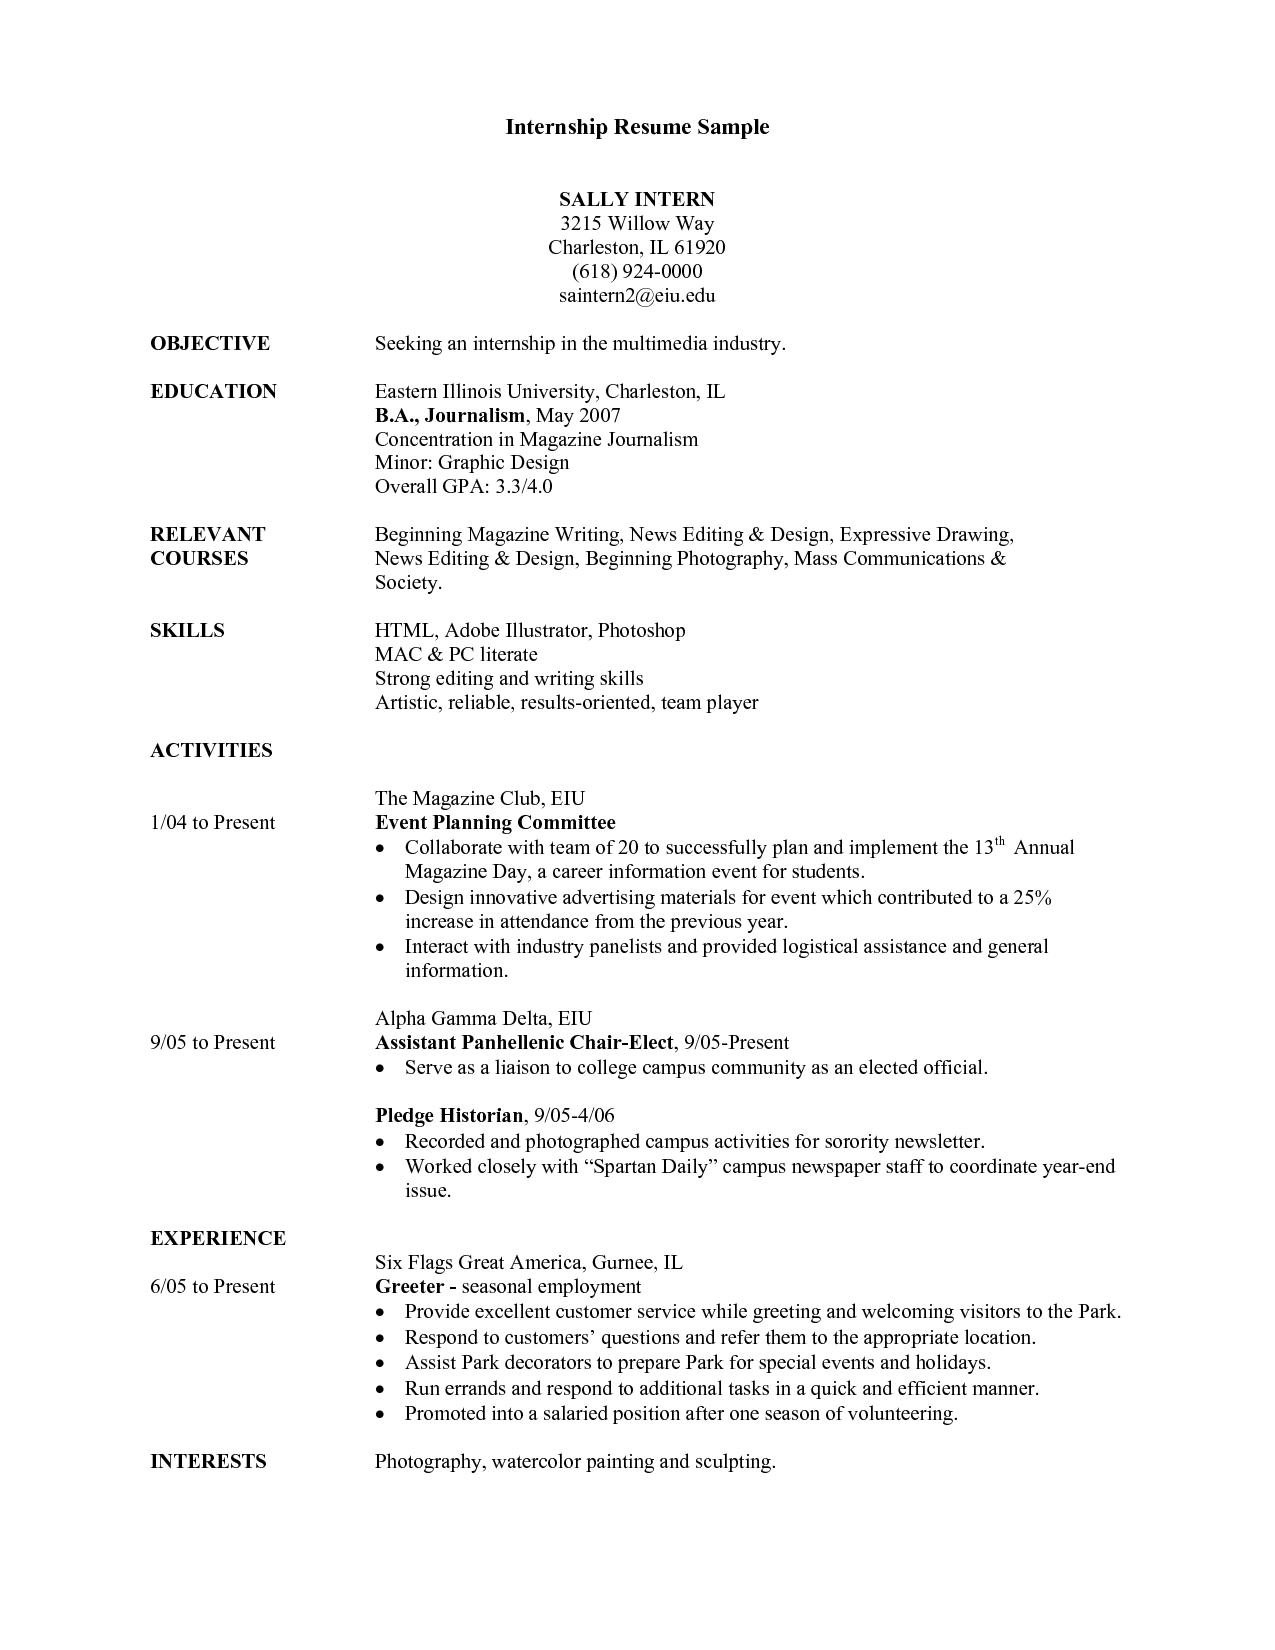 Resume Summary Example For Internship